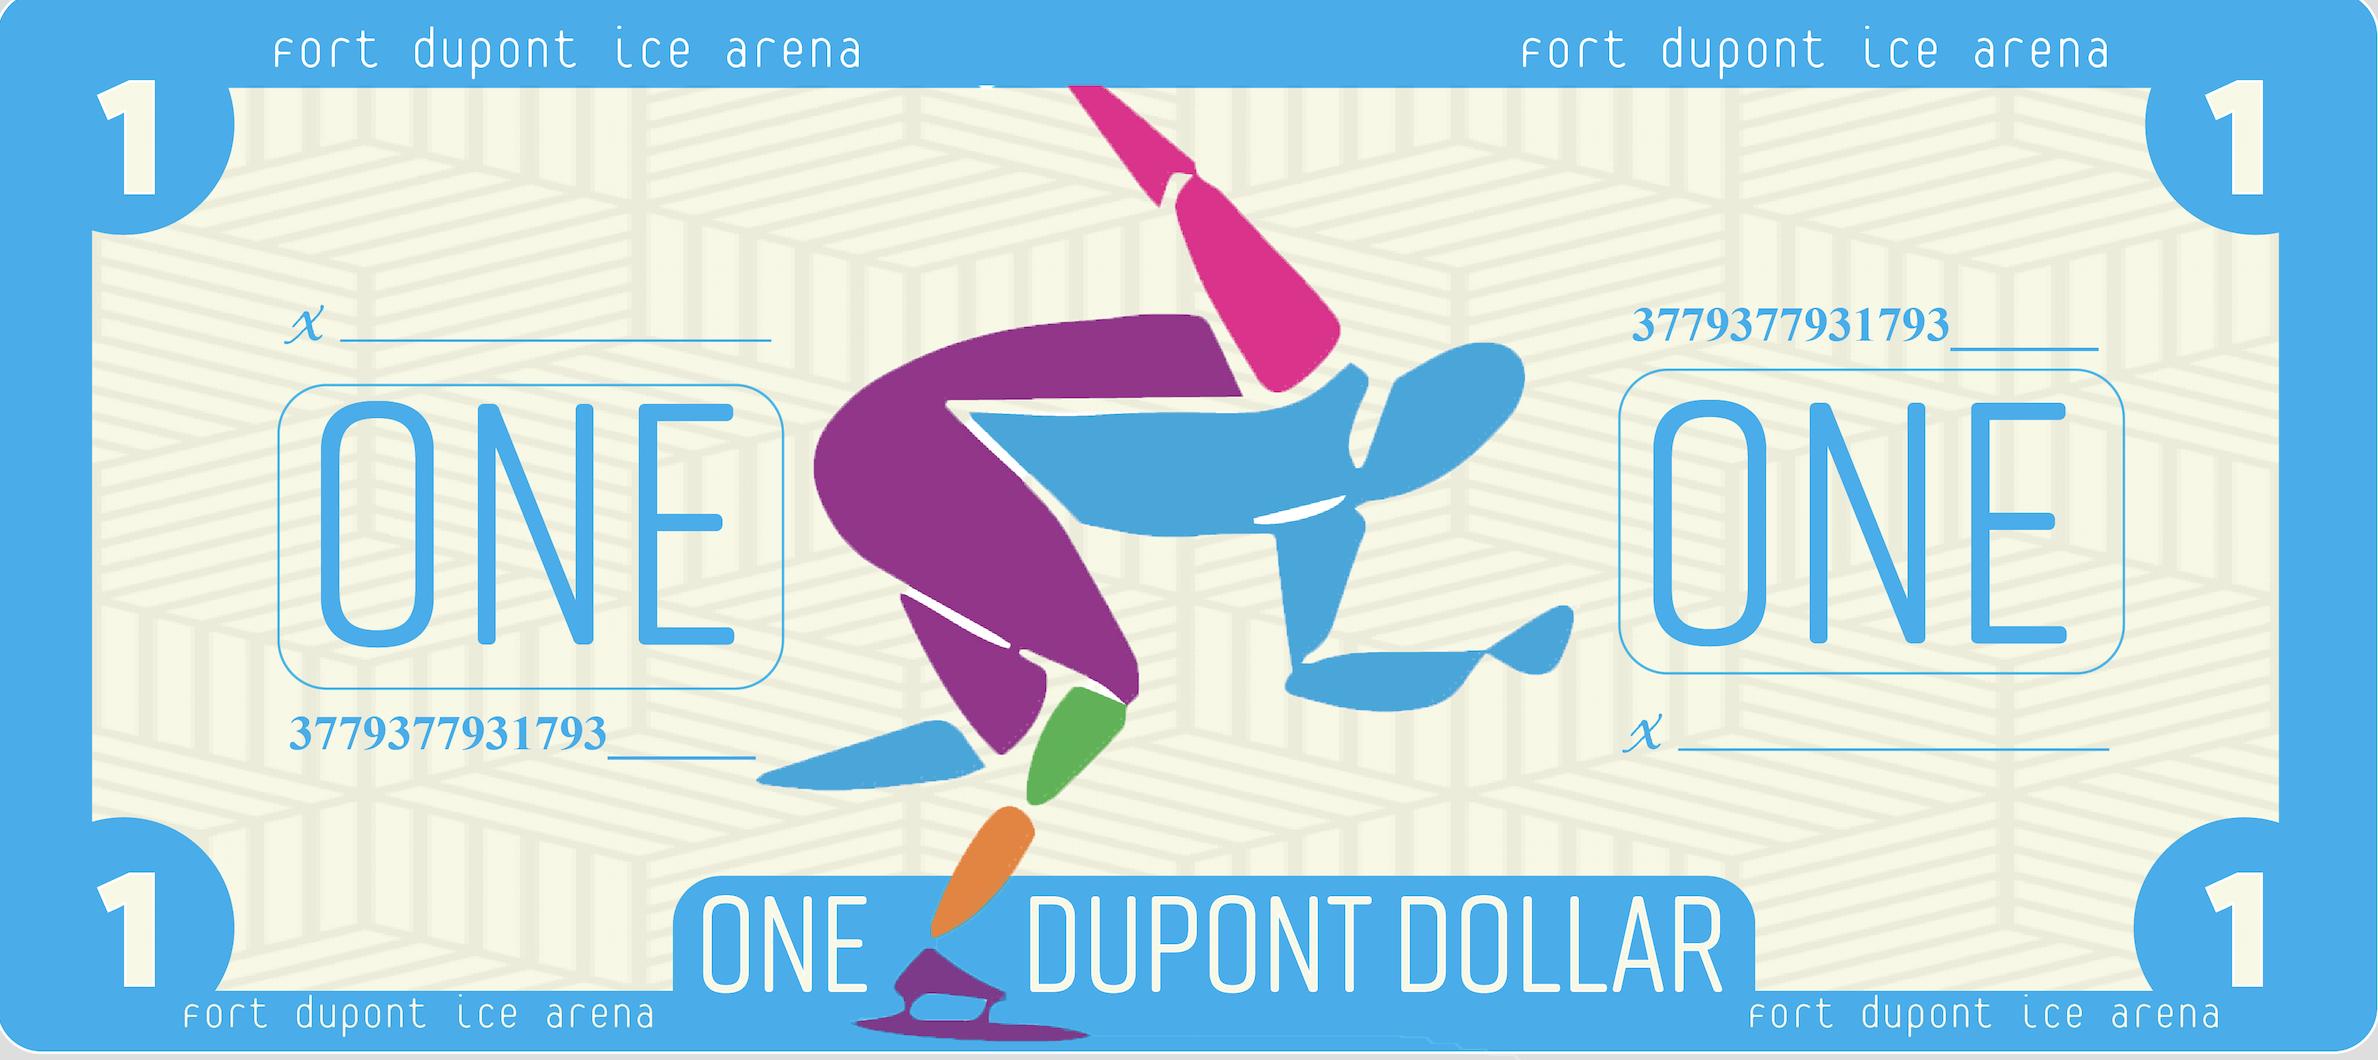 FDIA Dupont Dollars _ One